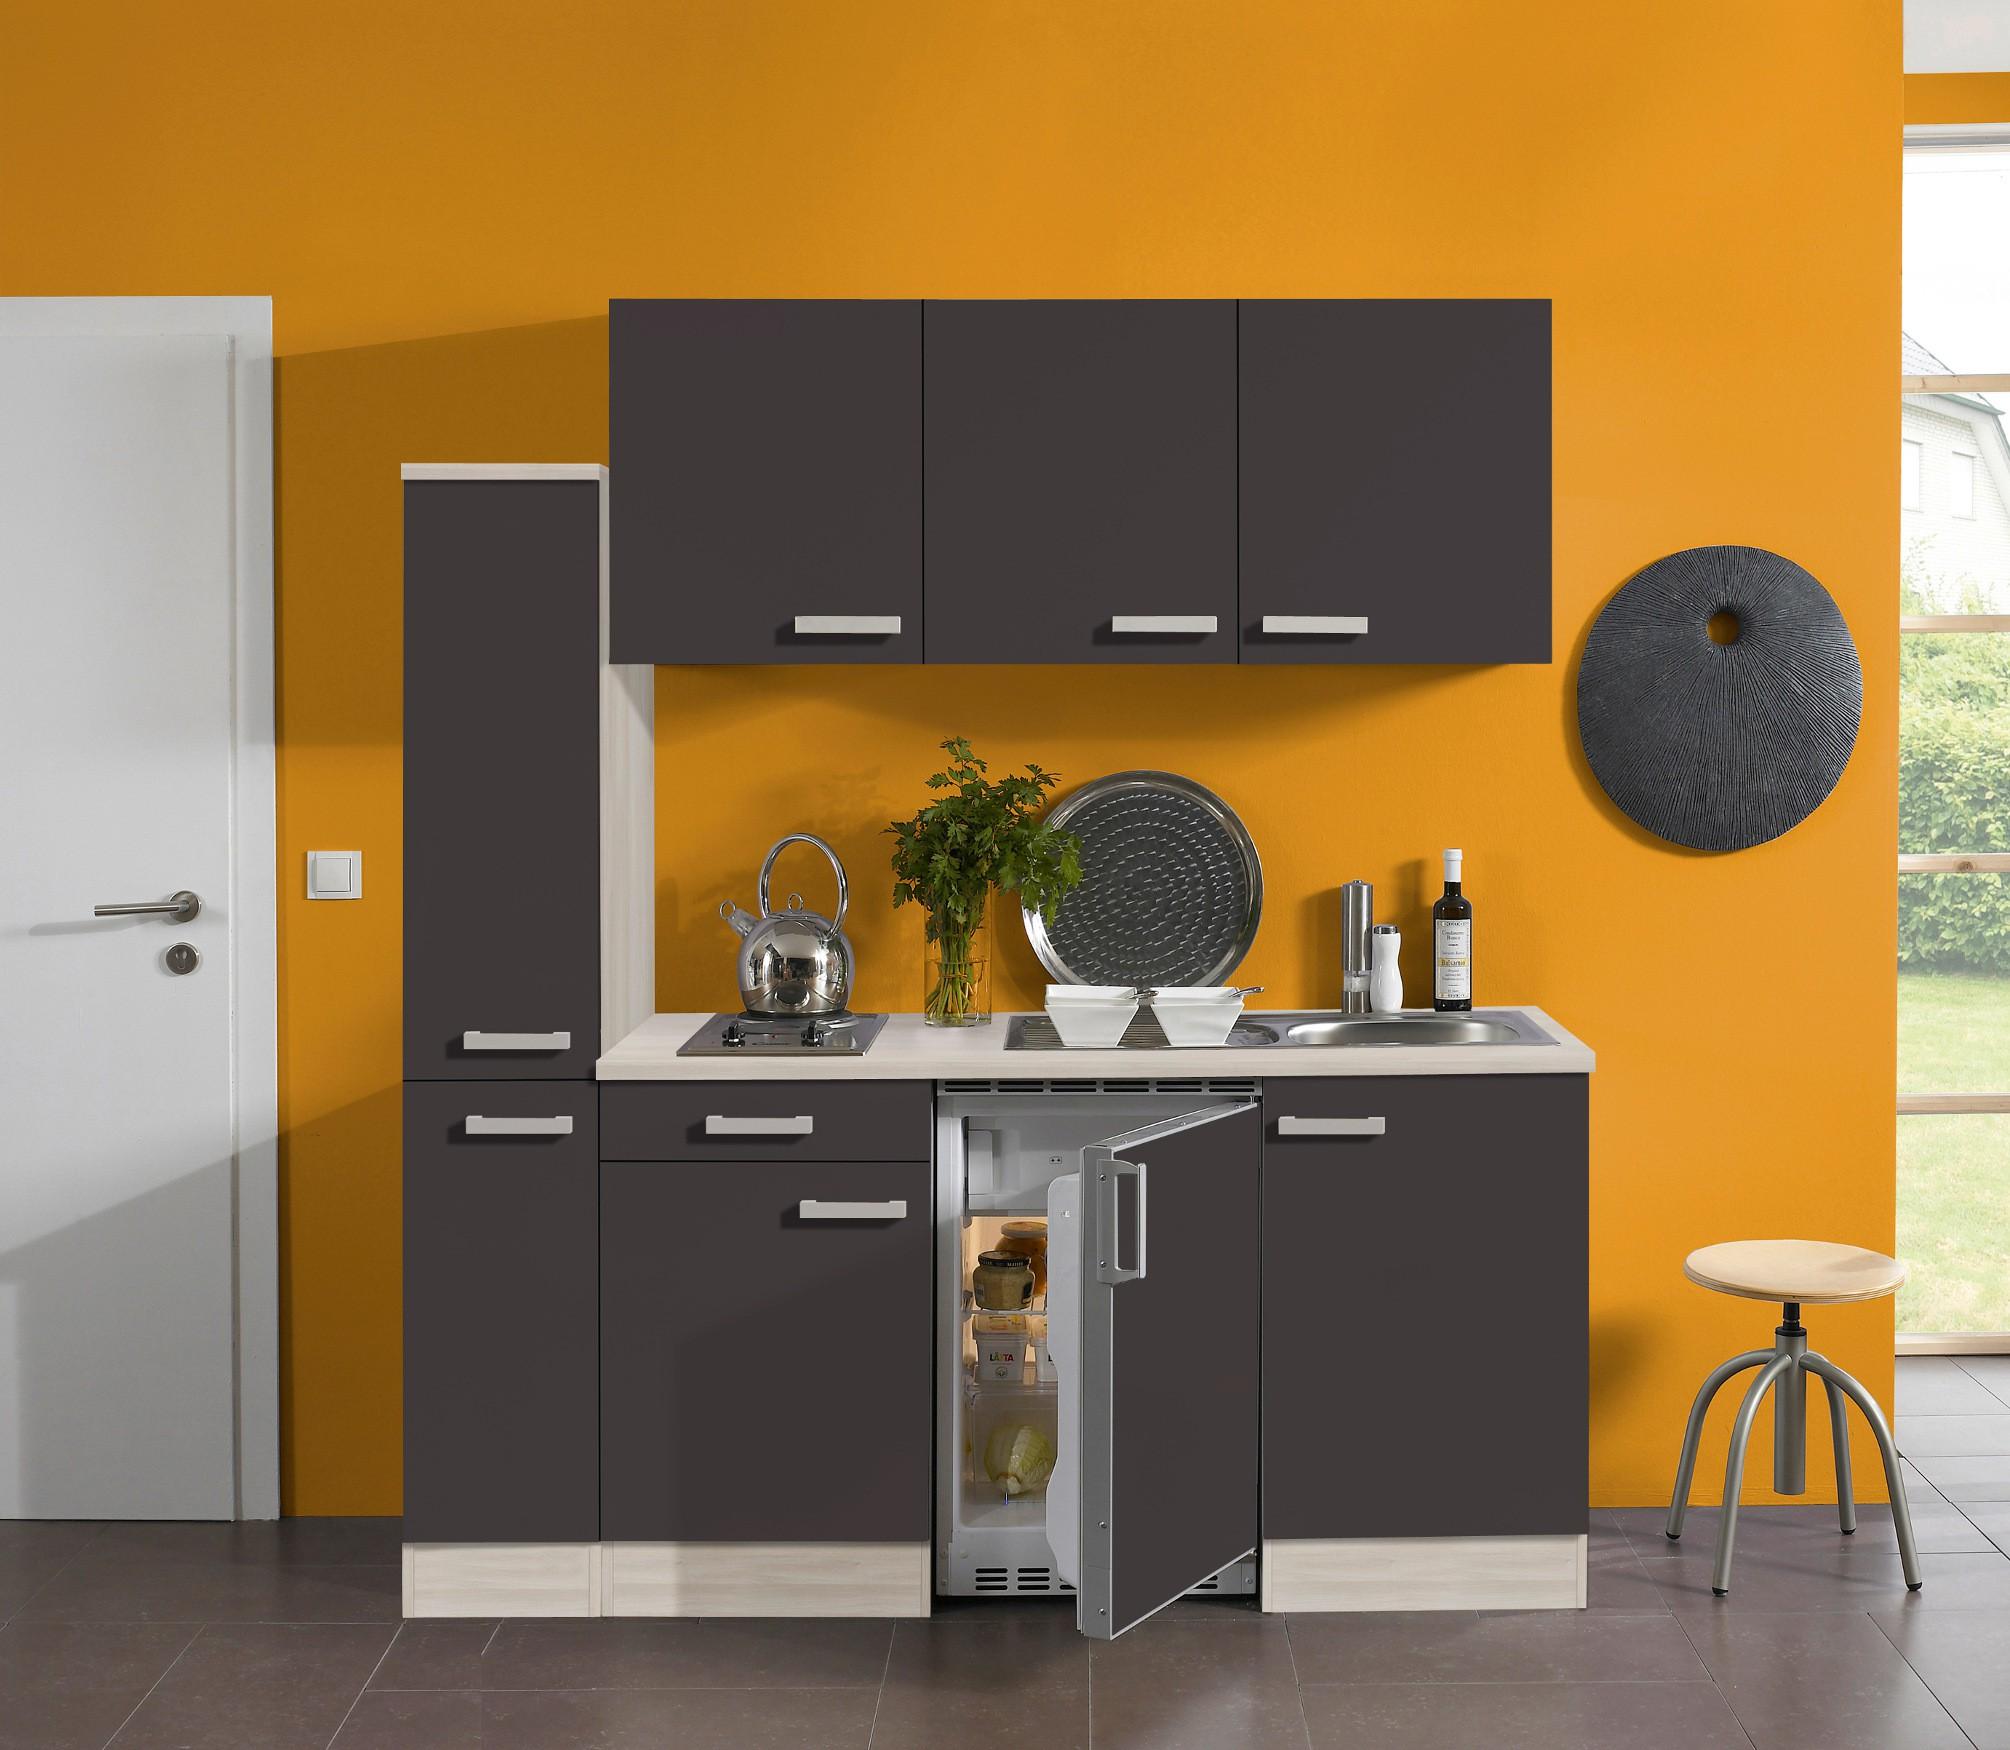 Miniküche Singleküche Mit Kühlschrank Spüle Doppel Kochplatte Küche 180 Cm  Grau